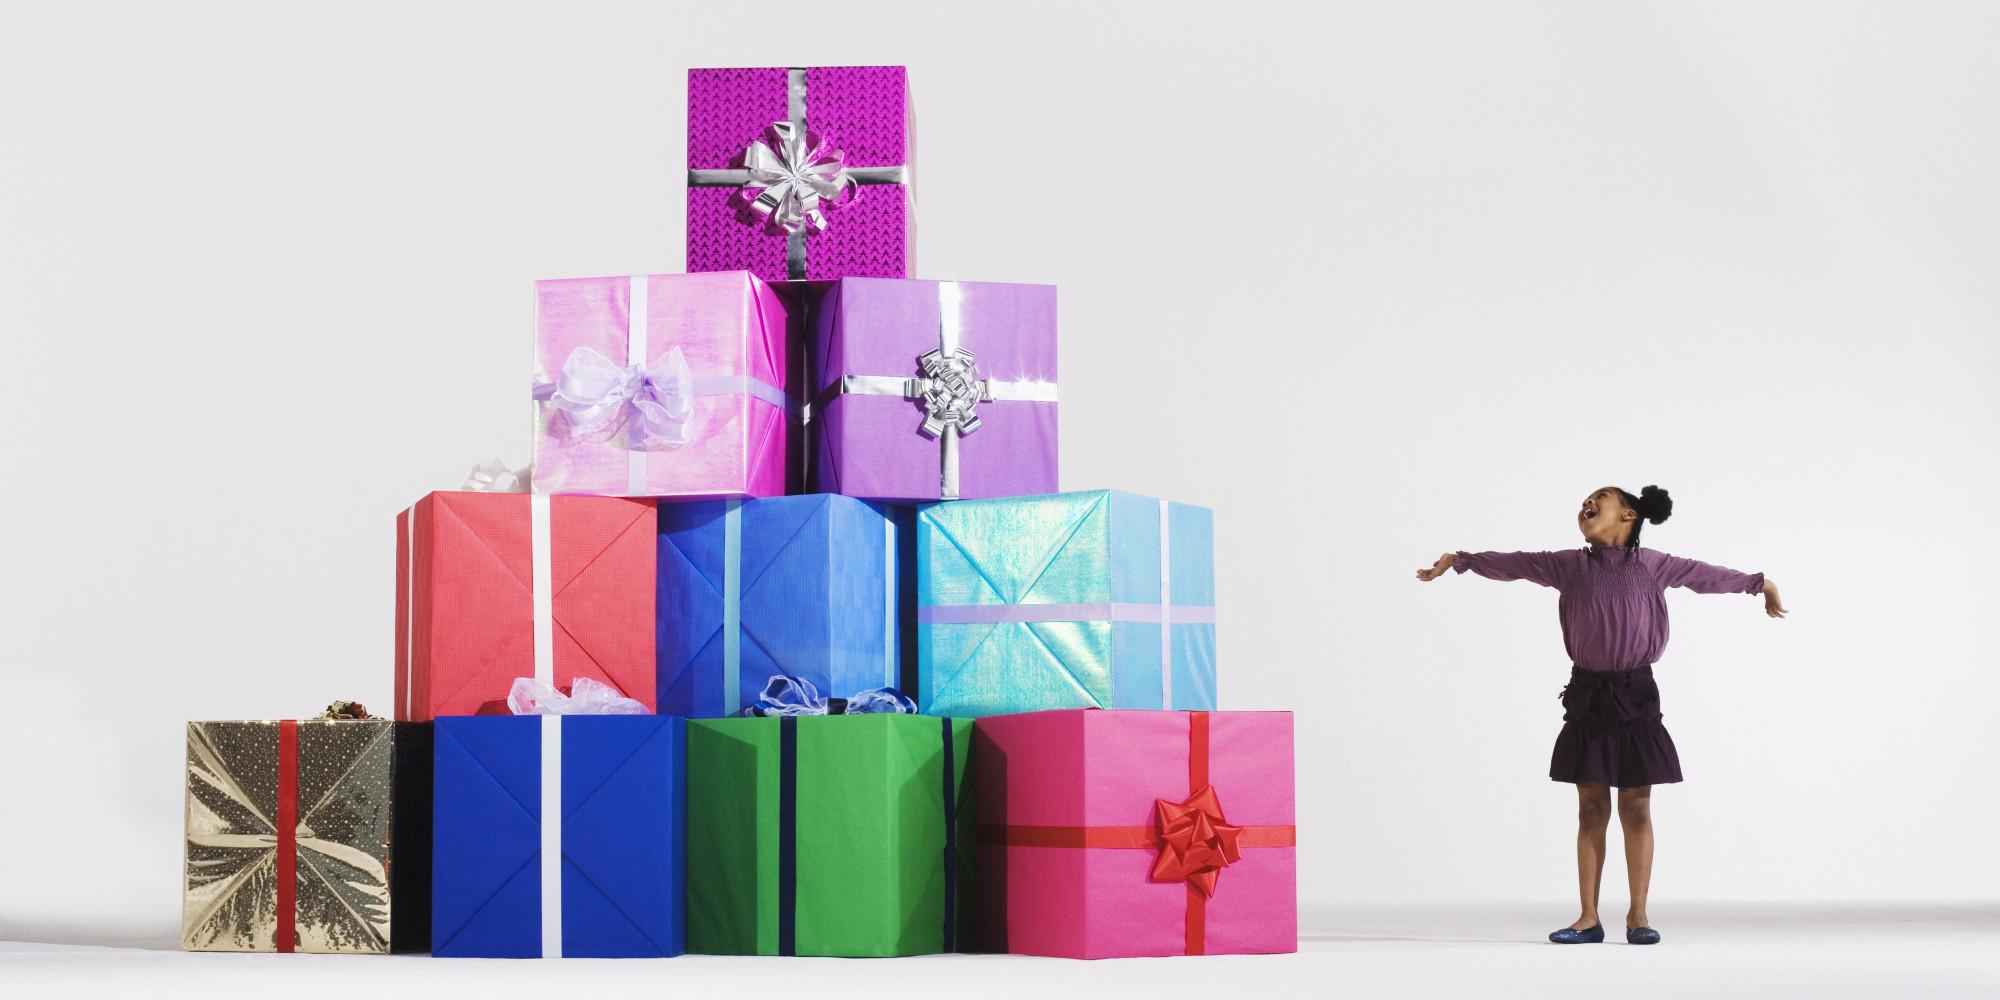 Gift Exchange Gift Ideas 50 - Gift Ideas